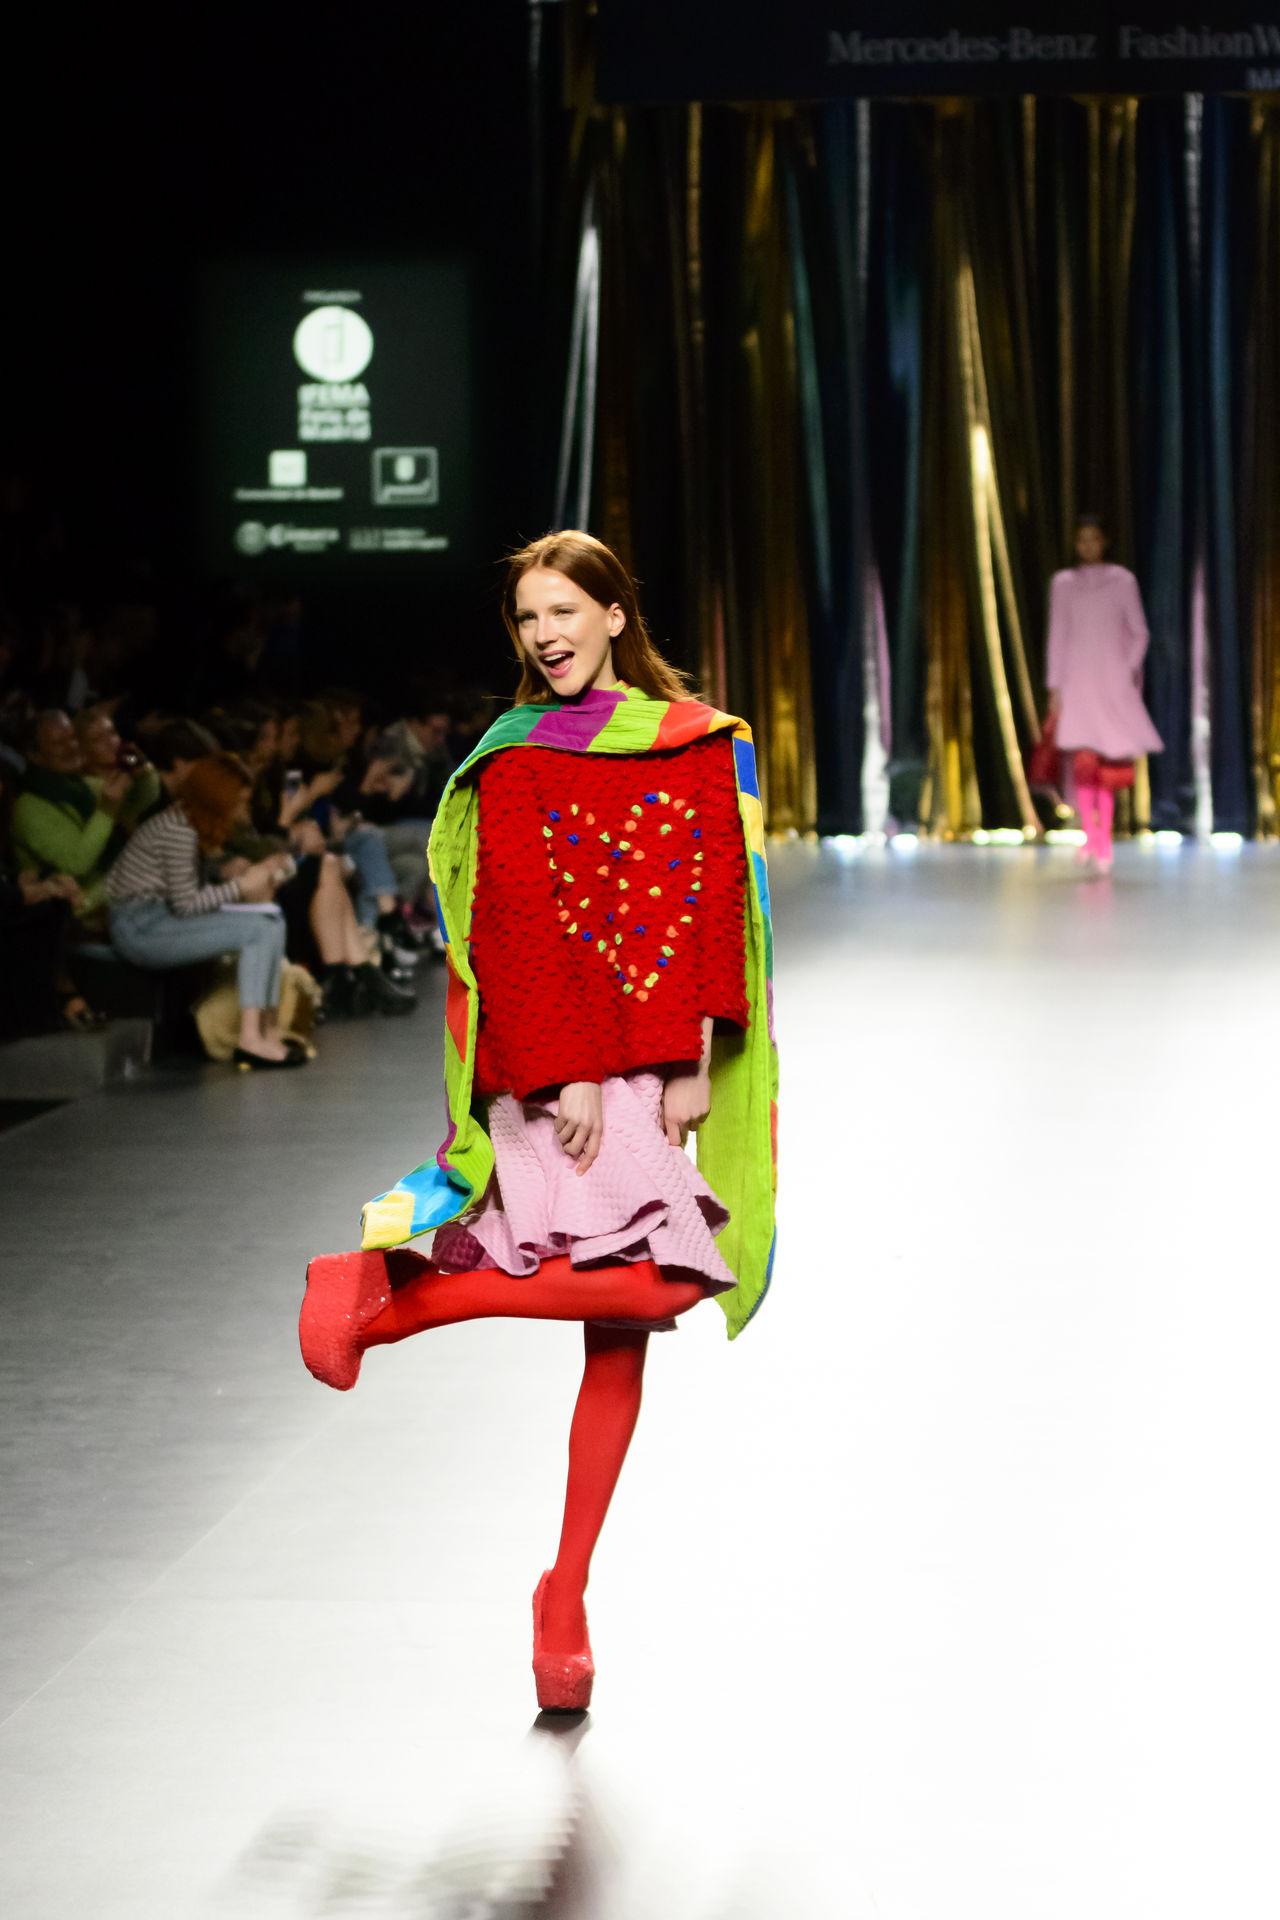 Agatha Ruiz De La Prada - Merecedes benz Fashion Week Madrid 2016 - Autumn-Winter 2016-2017. Catwalk Clothes Editorial  Fashion Fashion Show Fashion Week Full Length Lifestyles Mbfw Mbfw2016 Mercedes Benz Fashion Week Models Real People Woman Women Young Adult Young Women